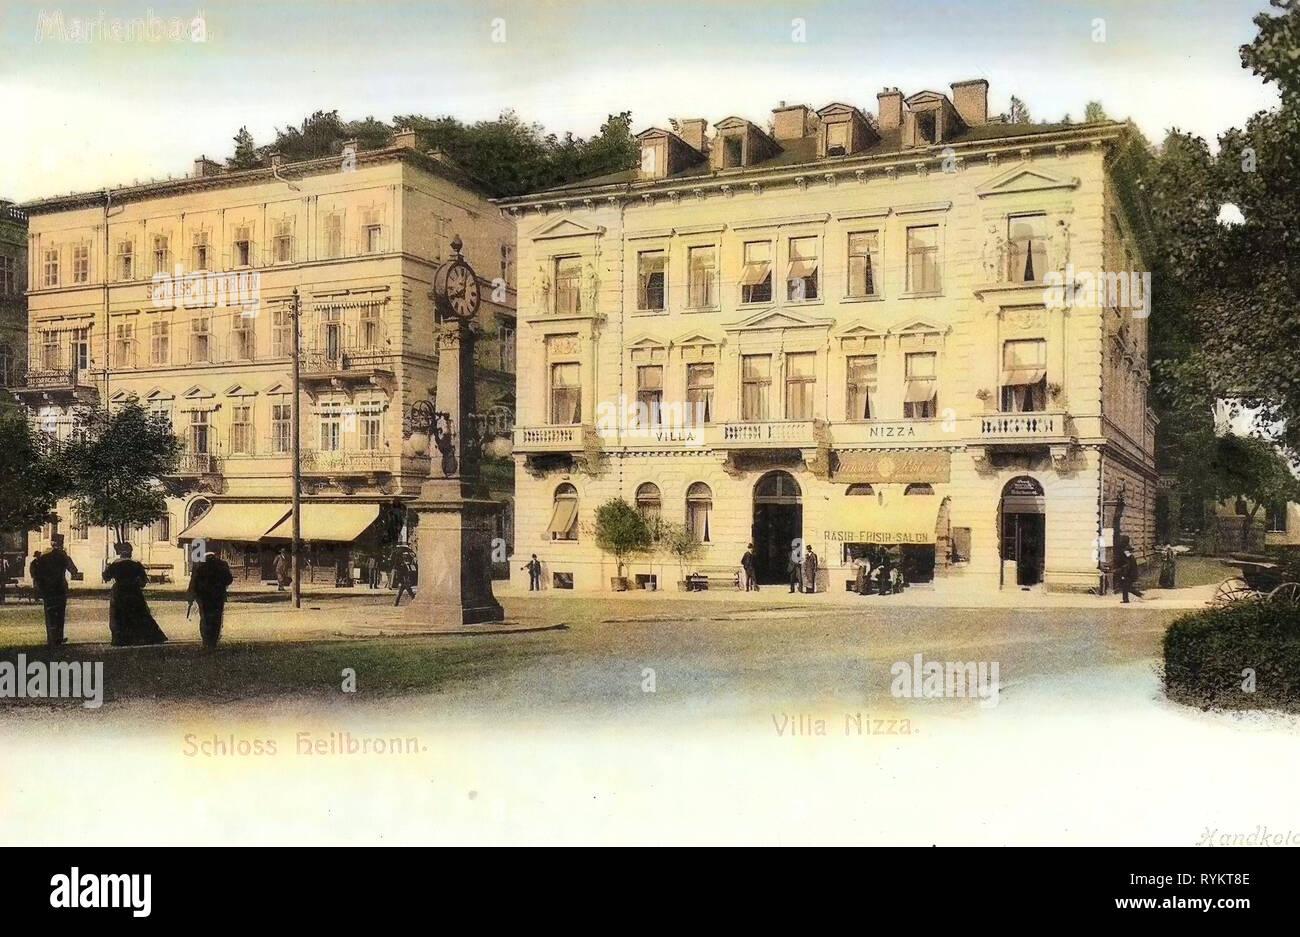 Villas in Mariánské Lázně, 1901, Karlovy Vary Region, Marienbad, Schloß Heilbronn, Villa Nizza, Czech Republic - Stock Image